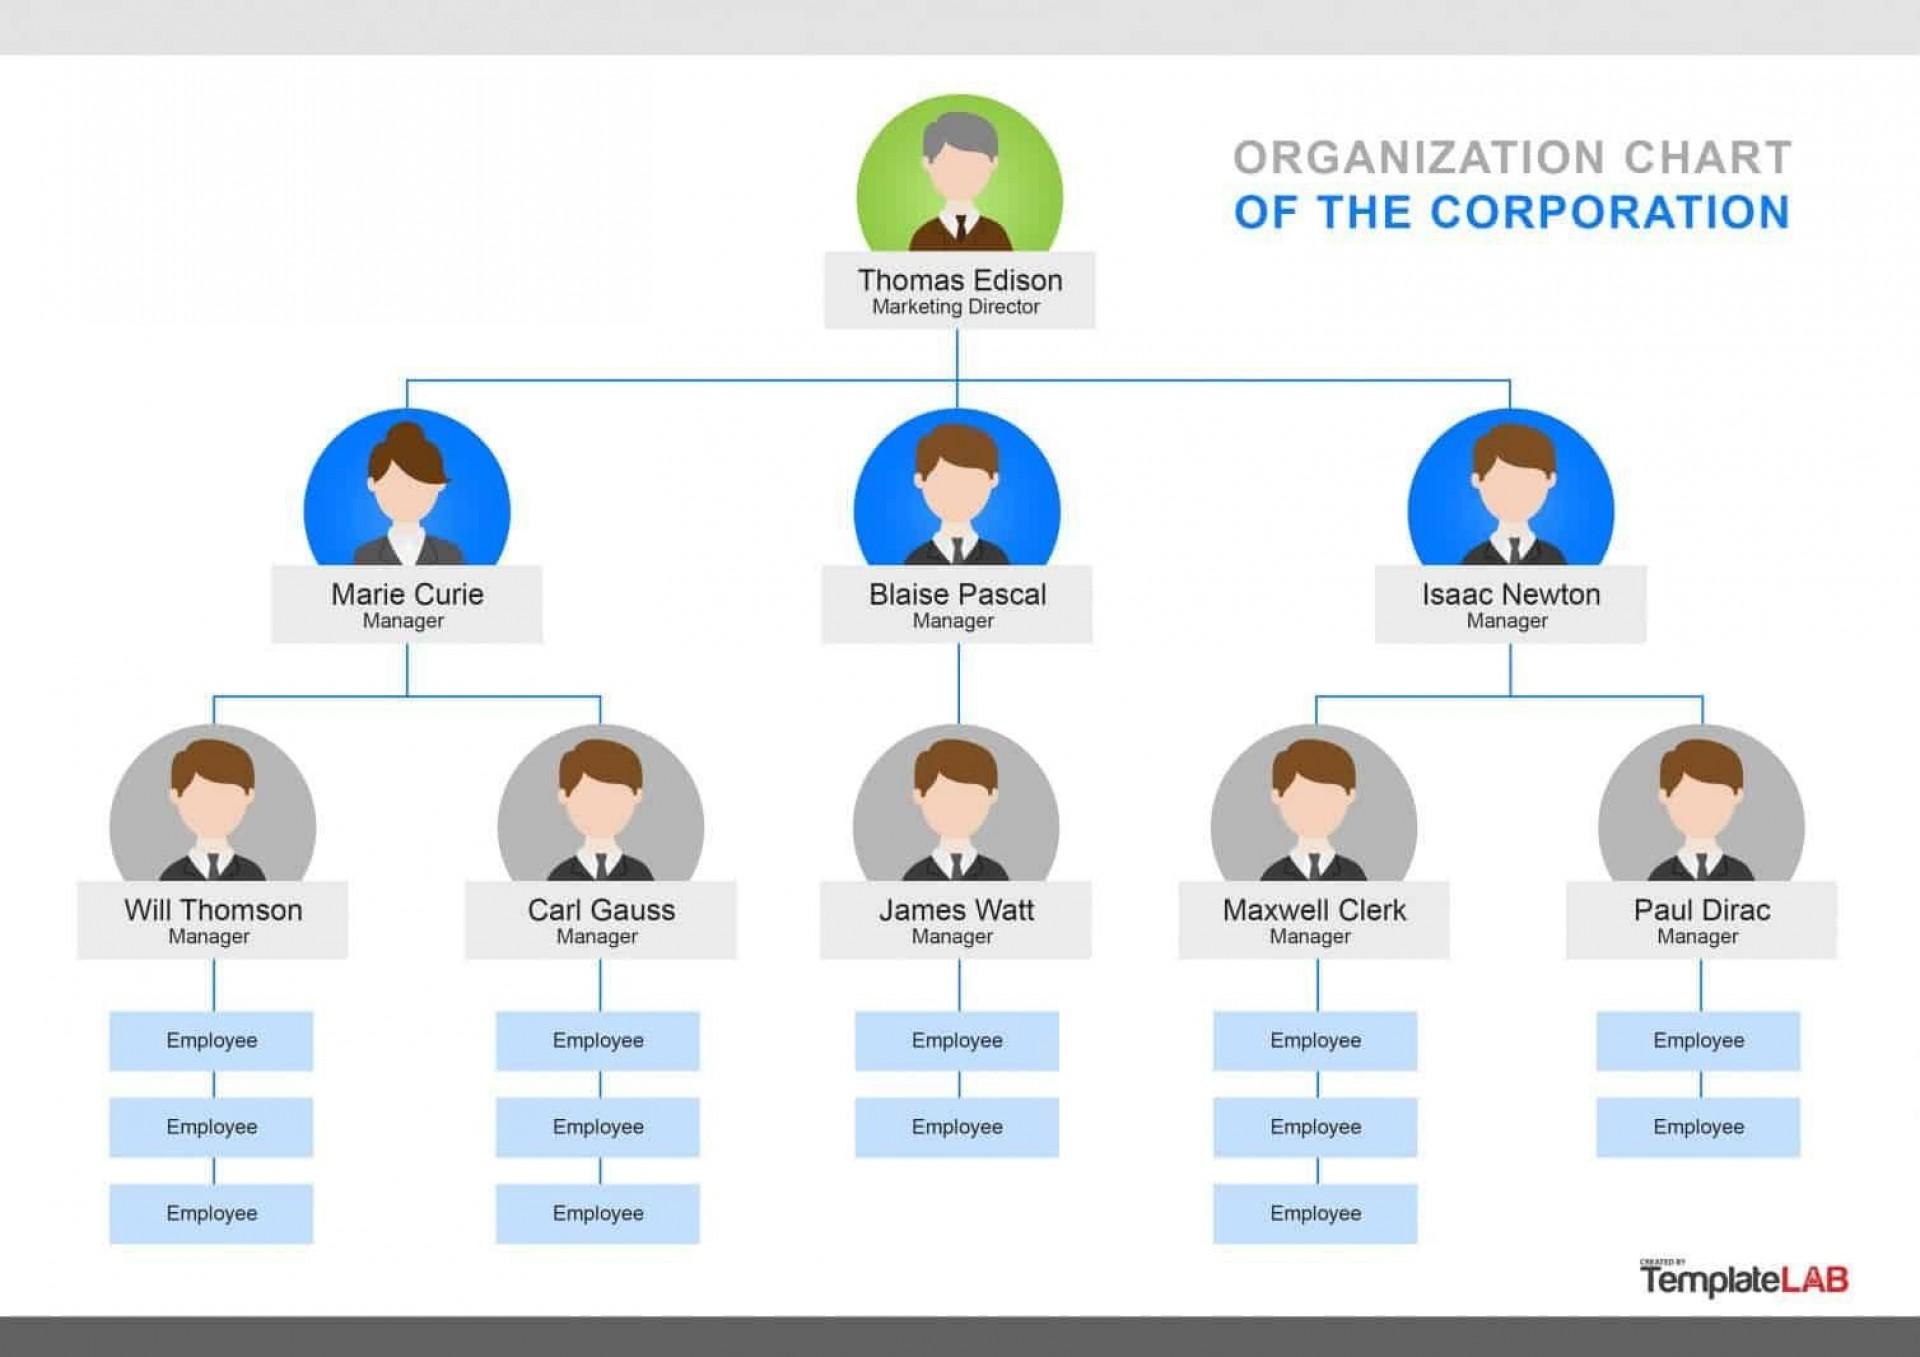 000 Frightening Organization Chart Template Excel 2010 Idea  Org Organizational1920